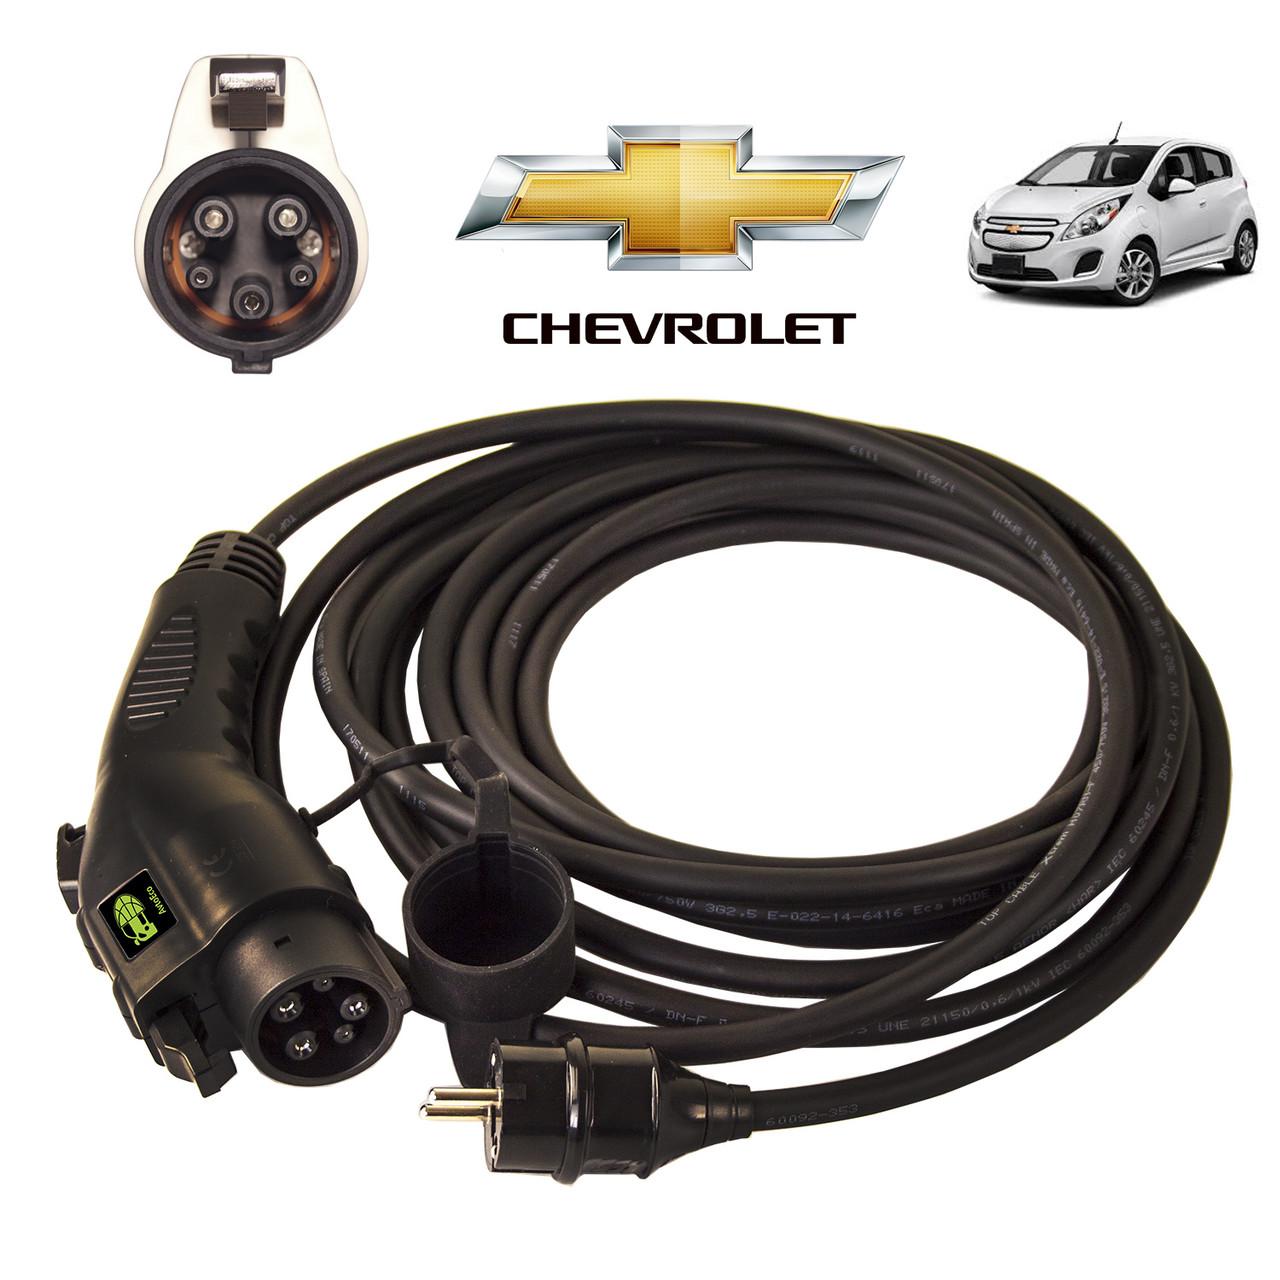 Зарядное устройство для электромобиля Chevrolet Spark AutoEco J1772-16A